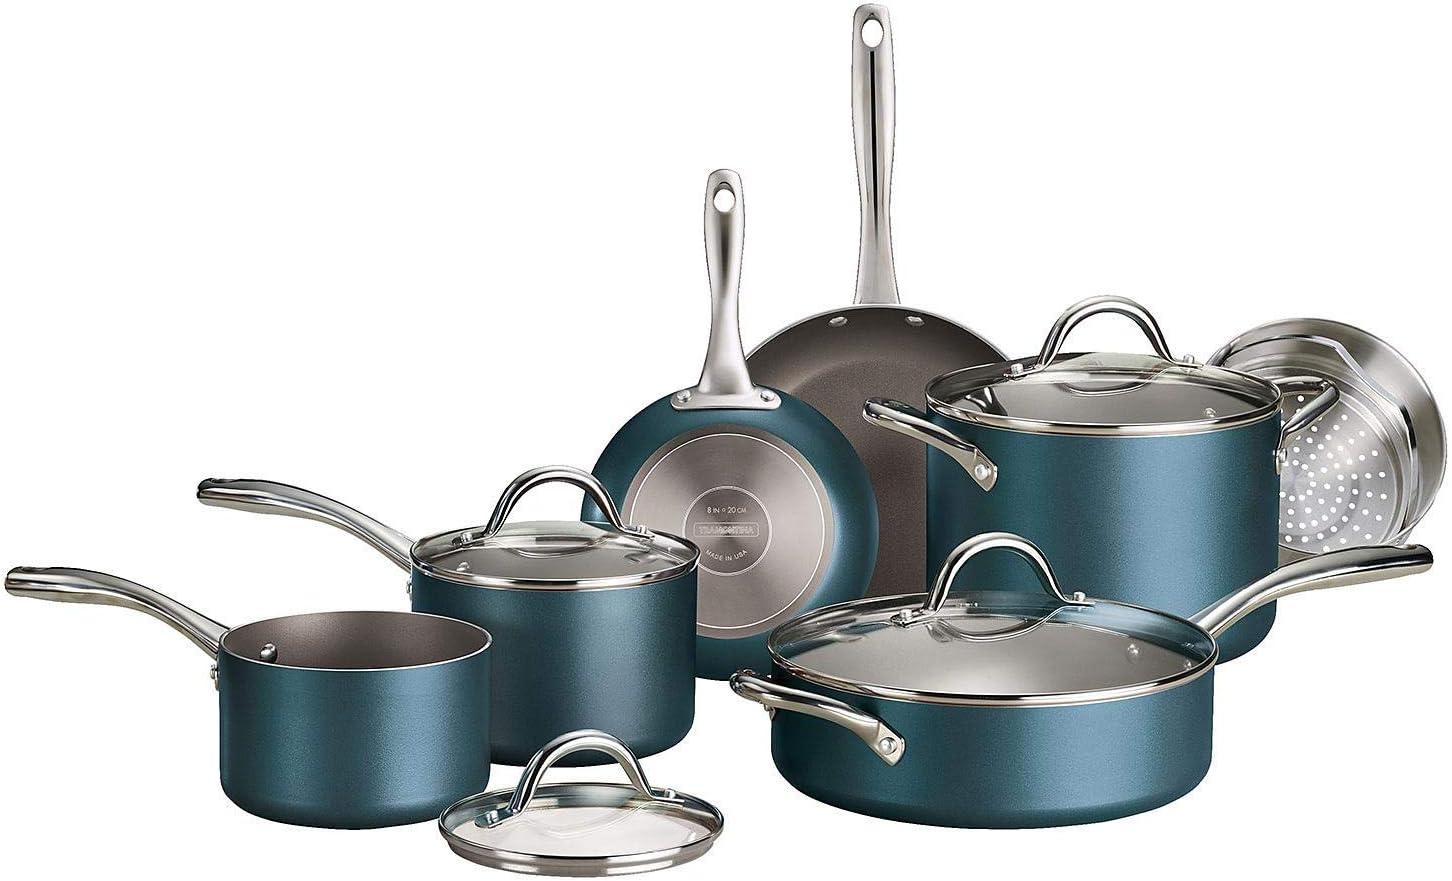 Tramontina 11-Piece Nonstick Cookware Set (Teal)